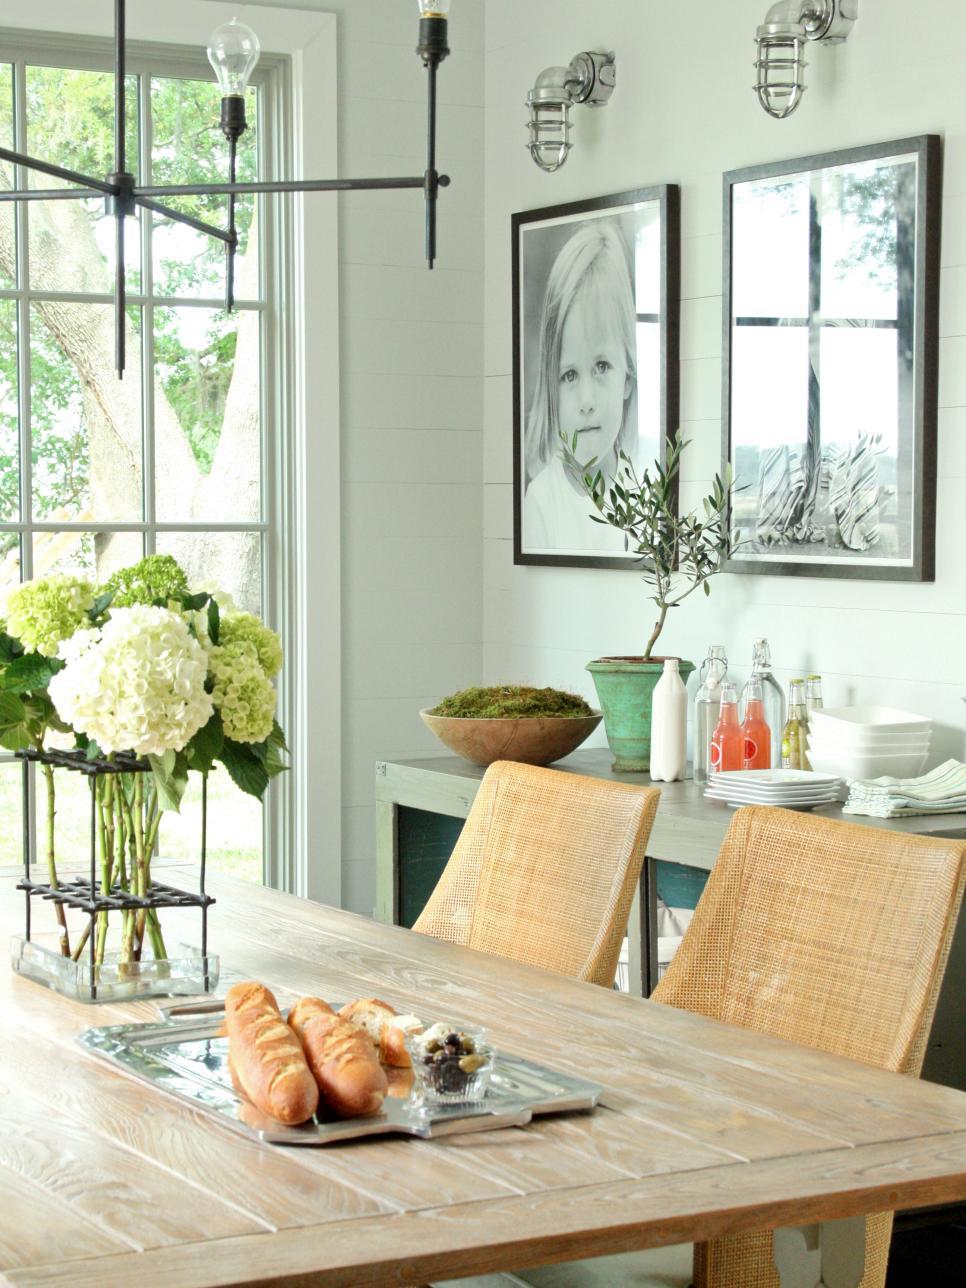 Cozy 15 Dining Room Decorating Ideas | HGTV dining room decoration ideas